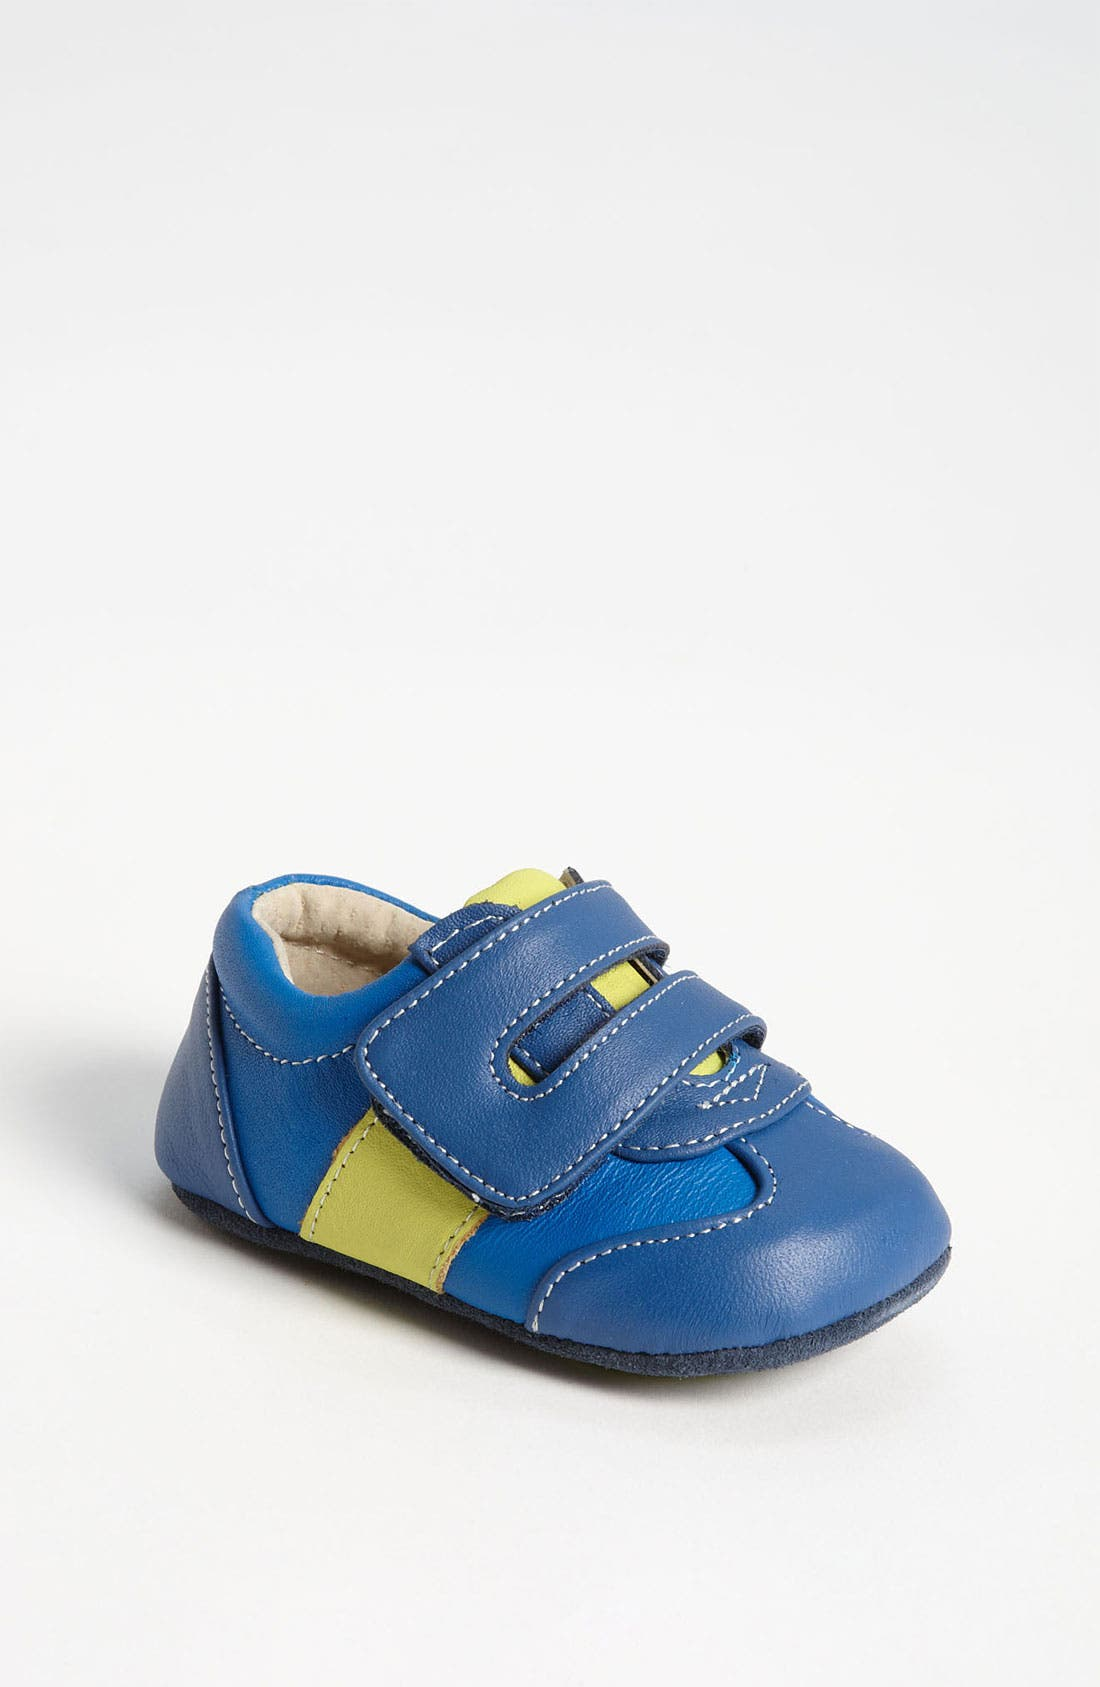 Alternate Image 1 Selected - See Kai Run 'Grant' Sneaker (Baby & Walker)